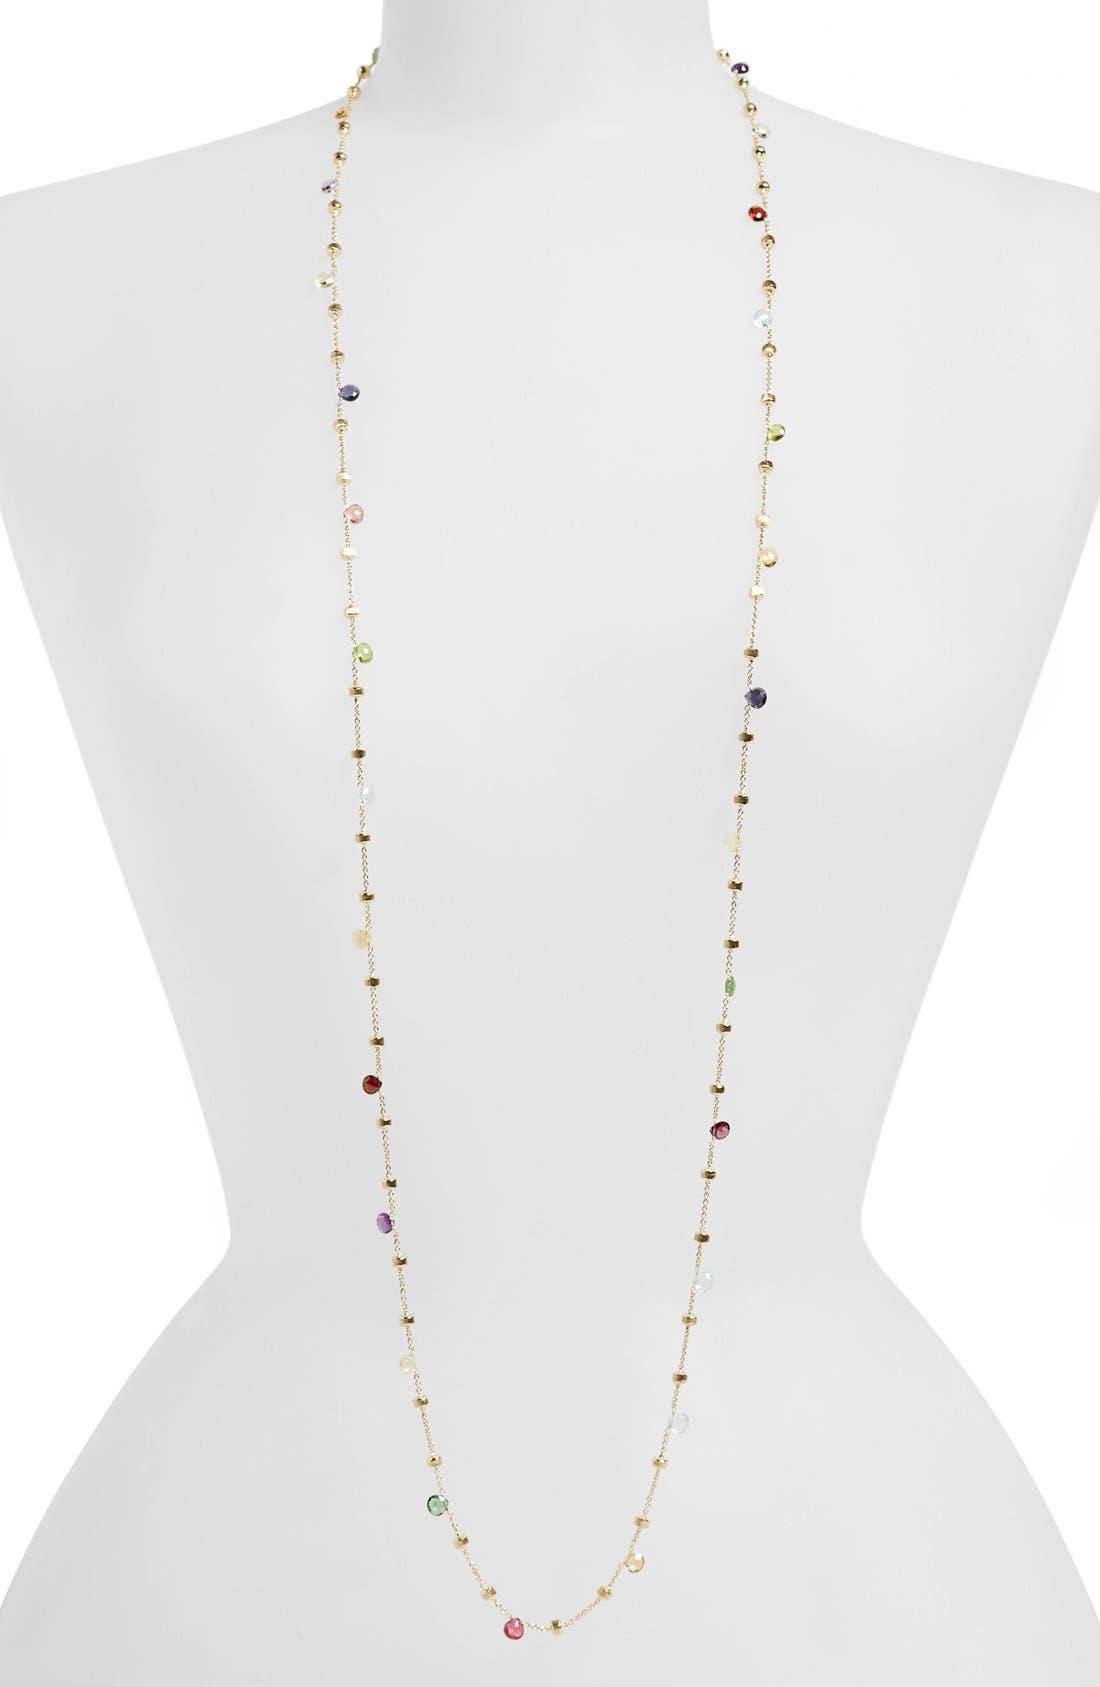 Alternate Image 1 Selected - Marco Bicego 'Paradise' Semiprecious Stone Long Necklace